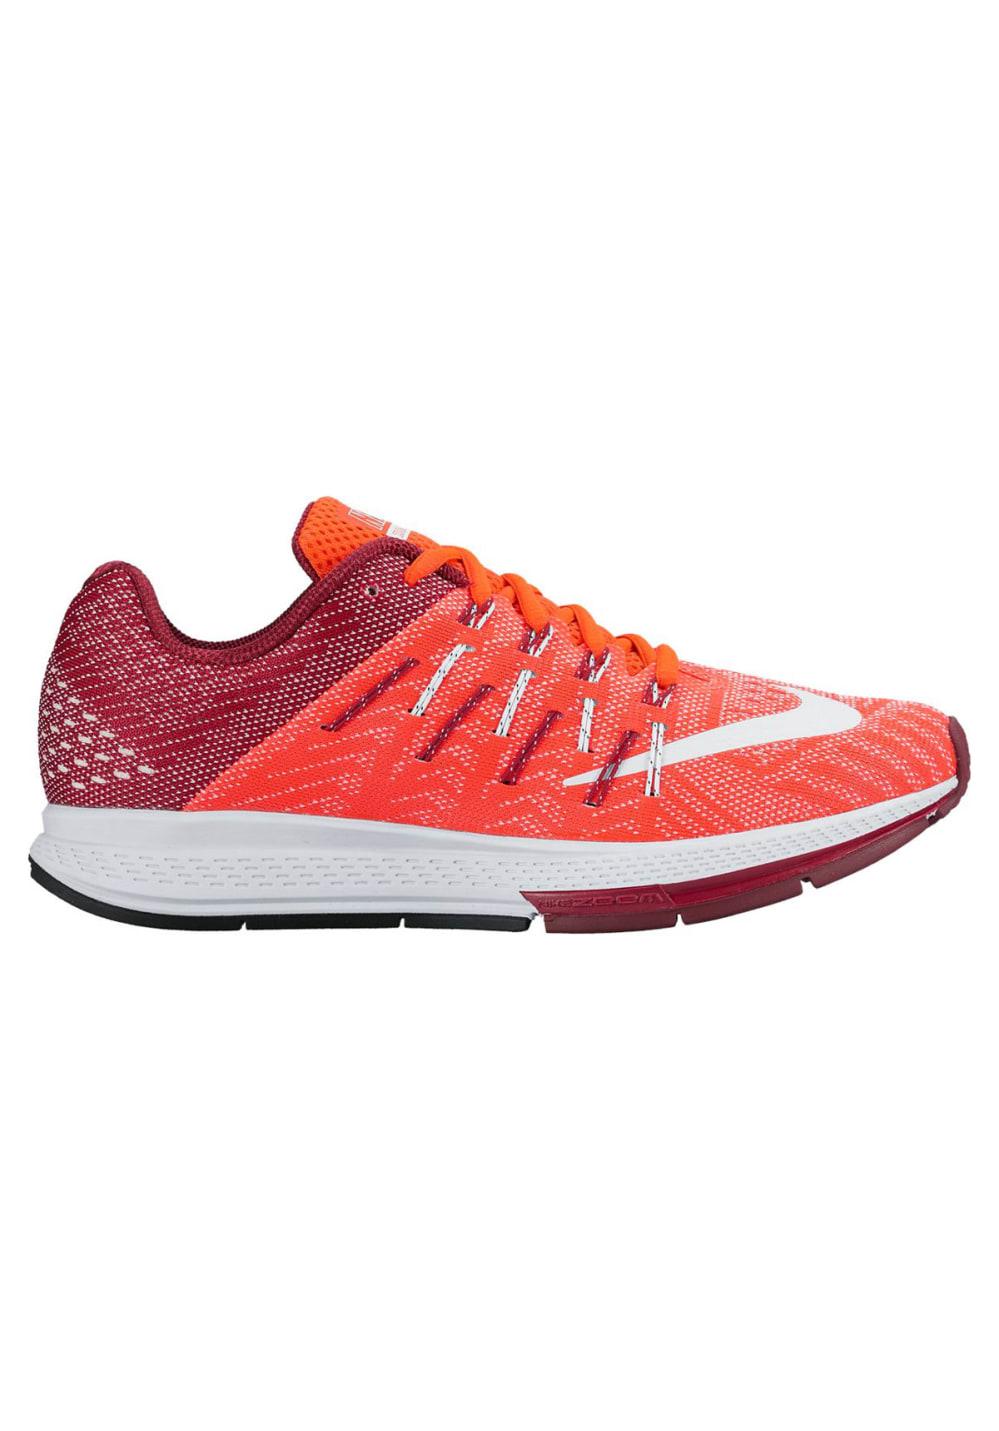 prix compétitif 7af71 cc0f6 Nike Air Zoom Elite 8 - Chaussures running pour Femme - Rouge